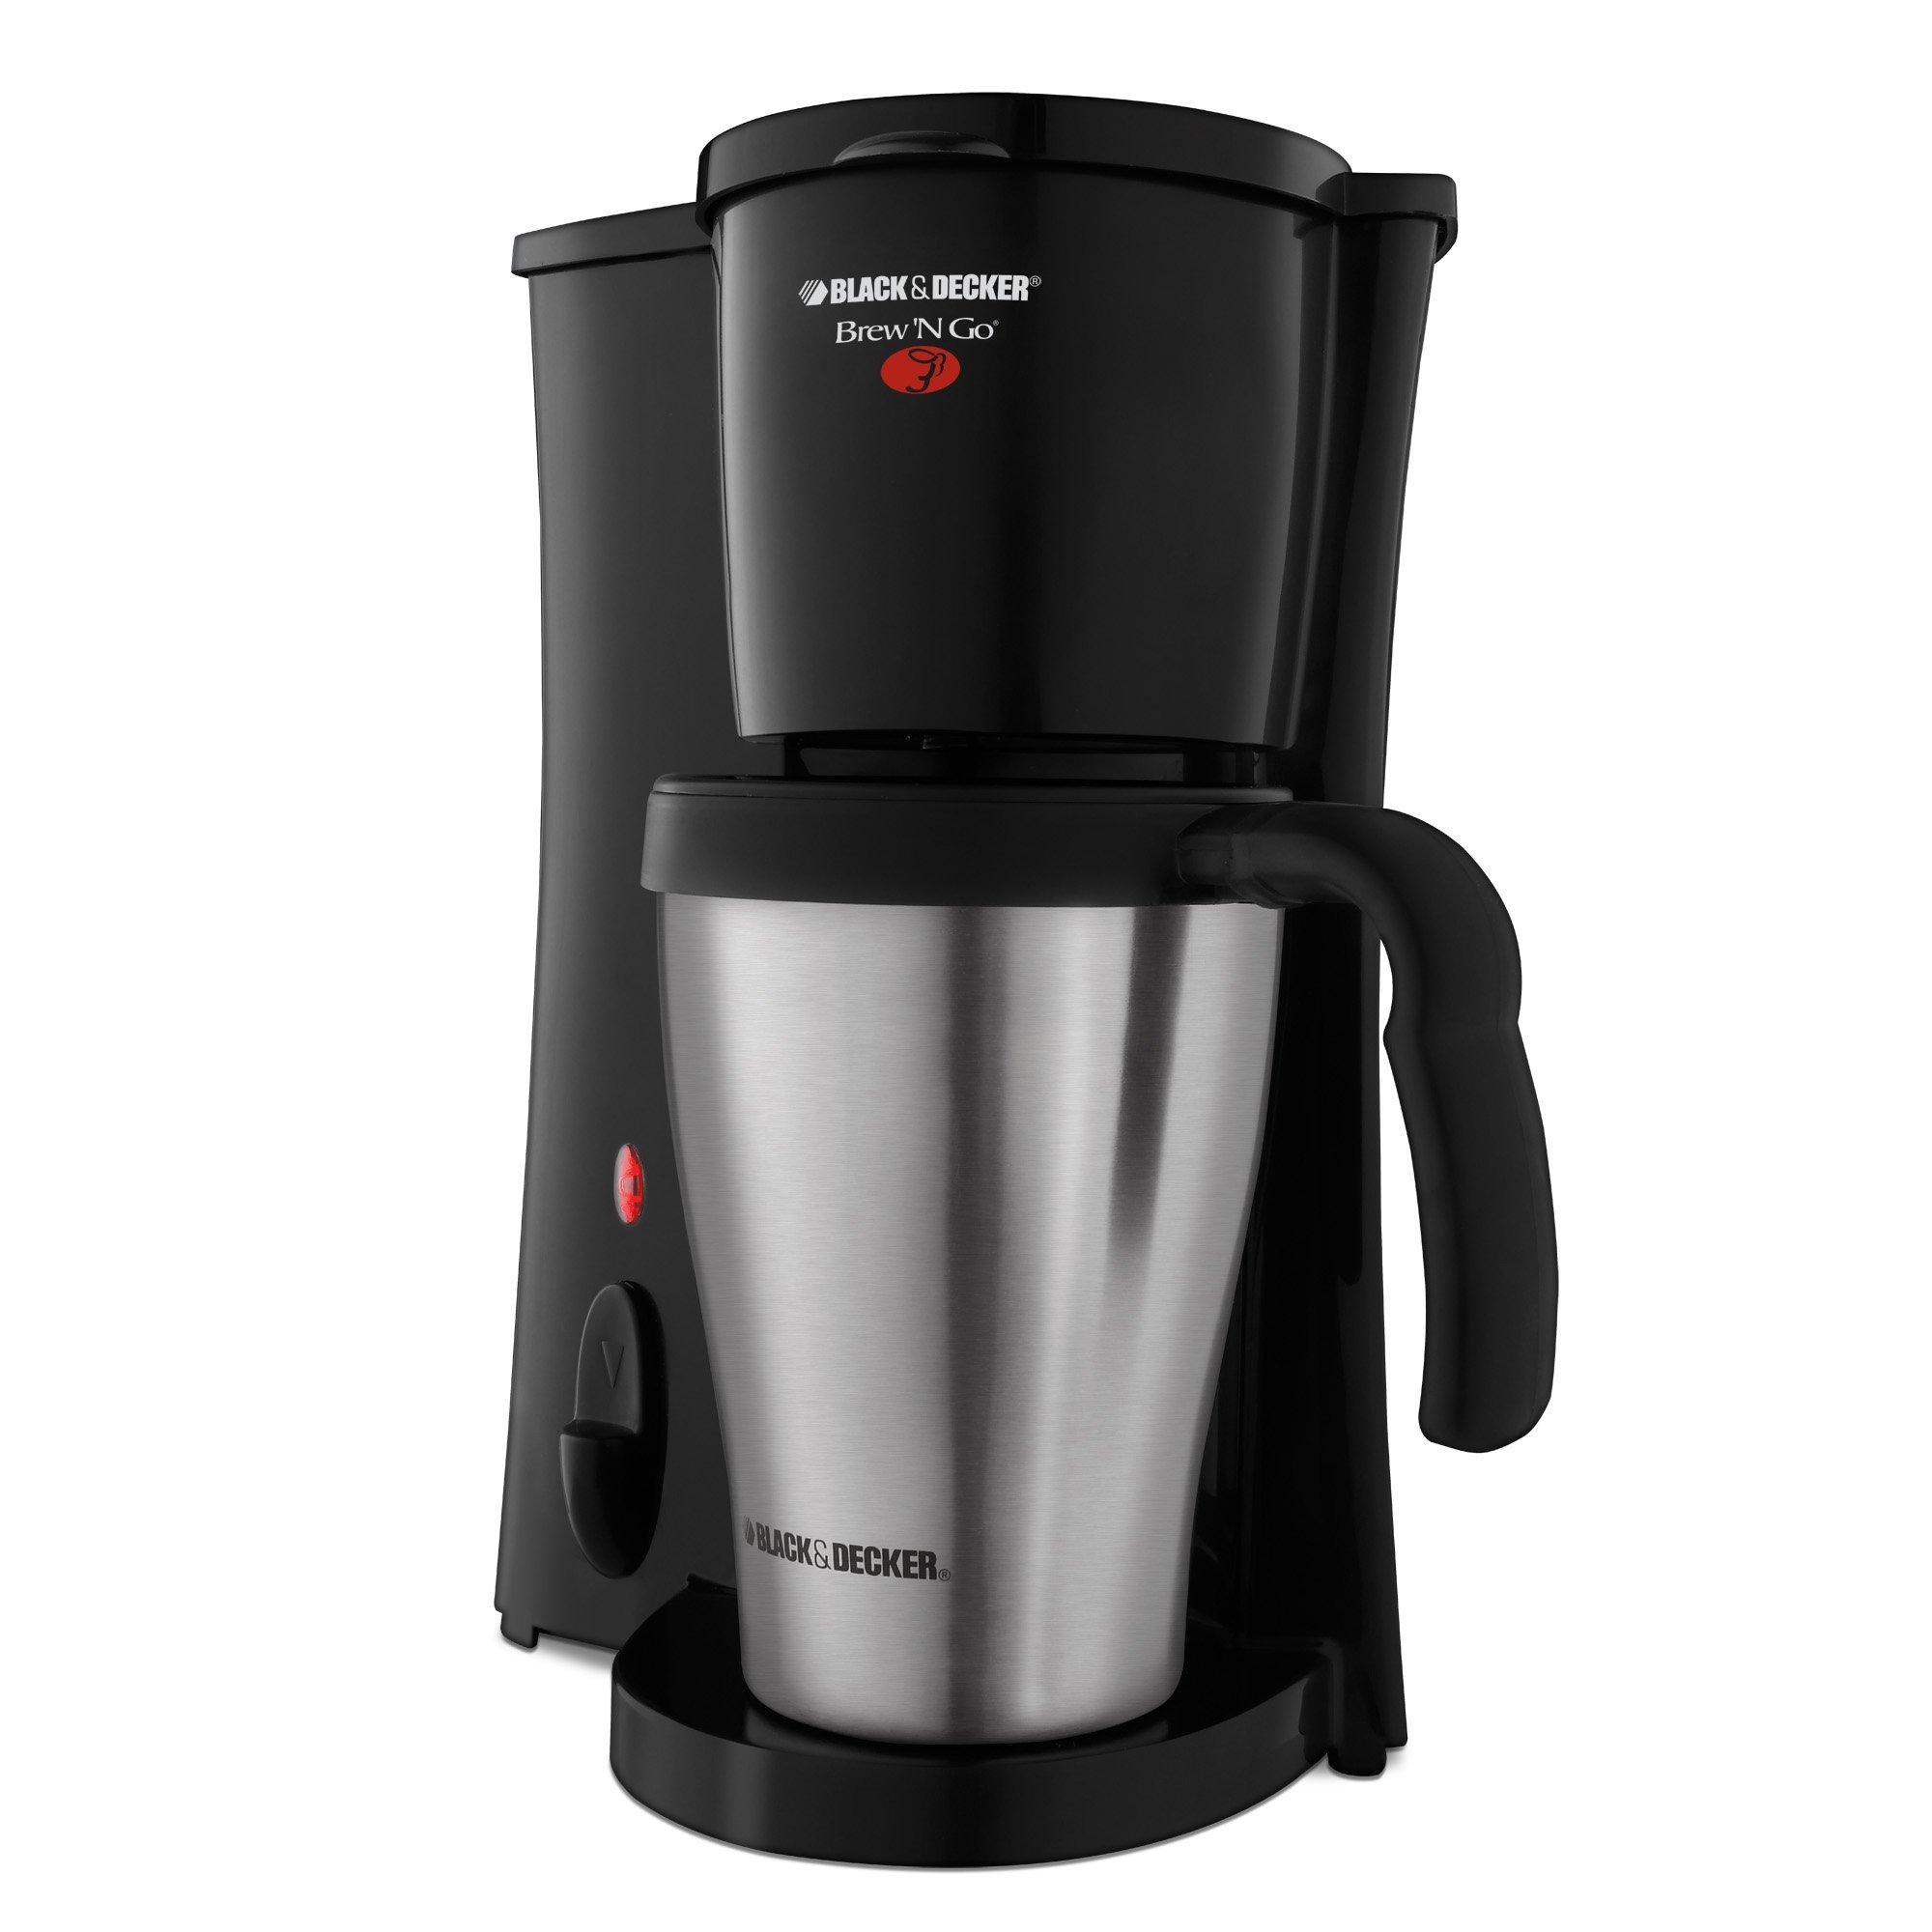 BLACK+DECKER DCM18S Brew 'n Go Personal Coffeemaker with Travel Mug, Black/Stainless Steel by Black & Decker (Image #2)